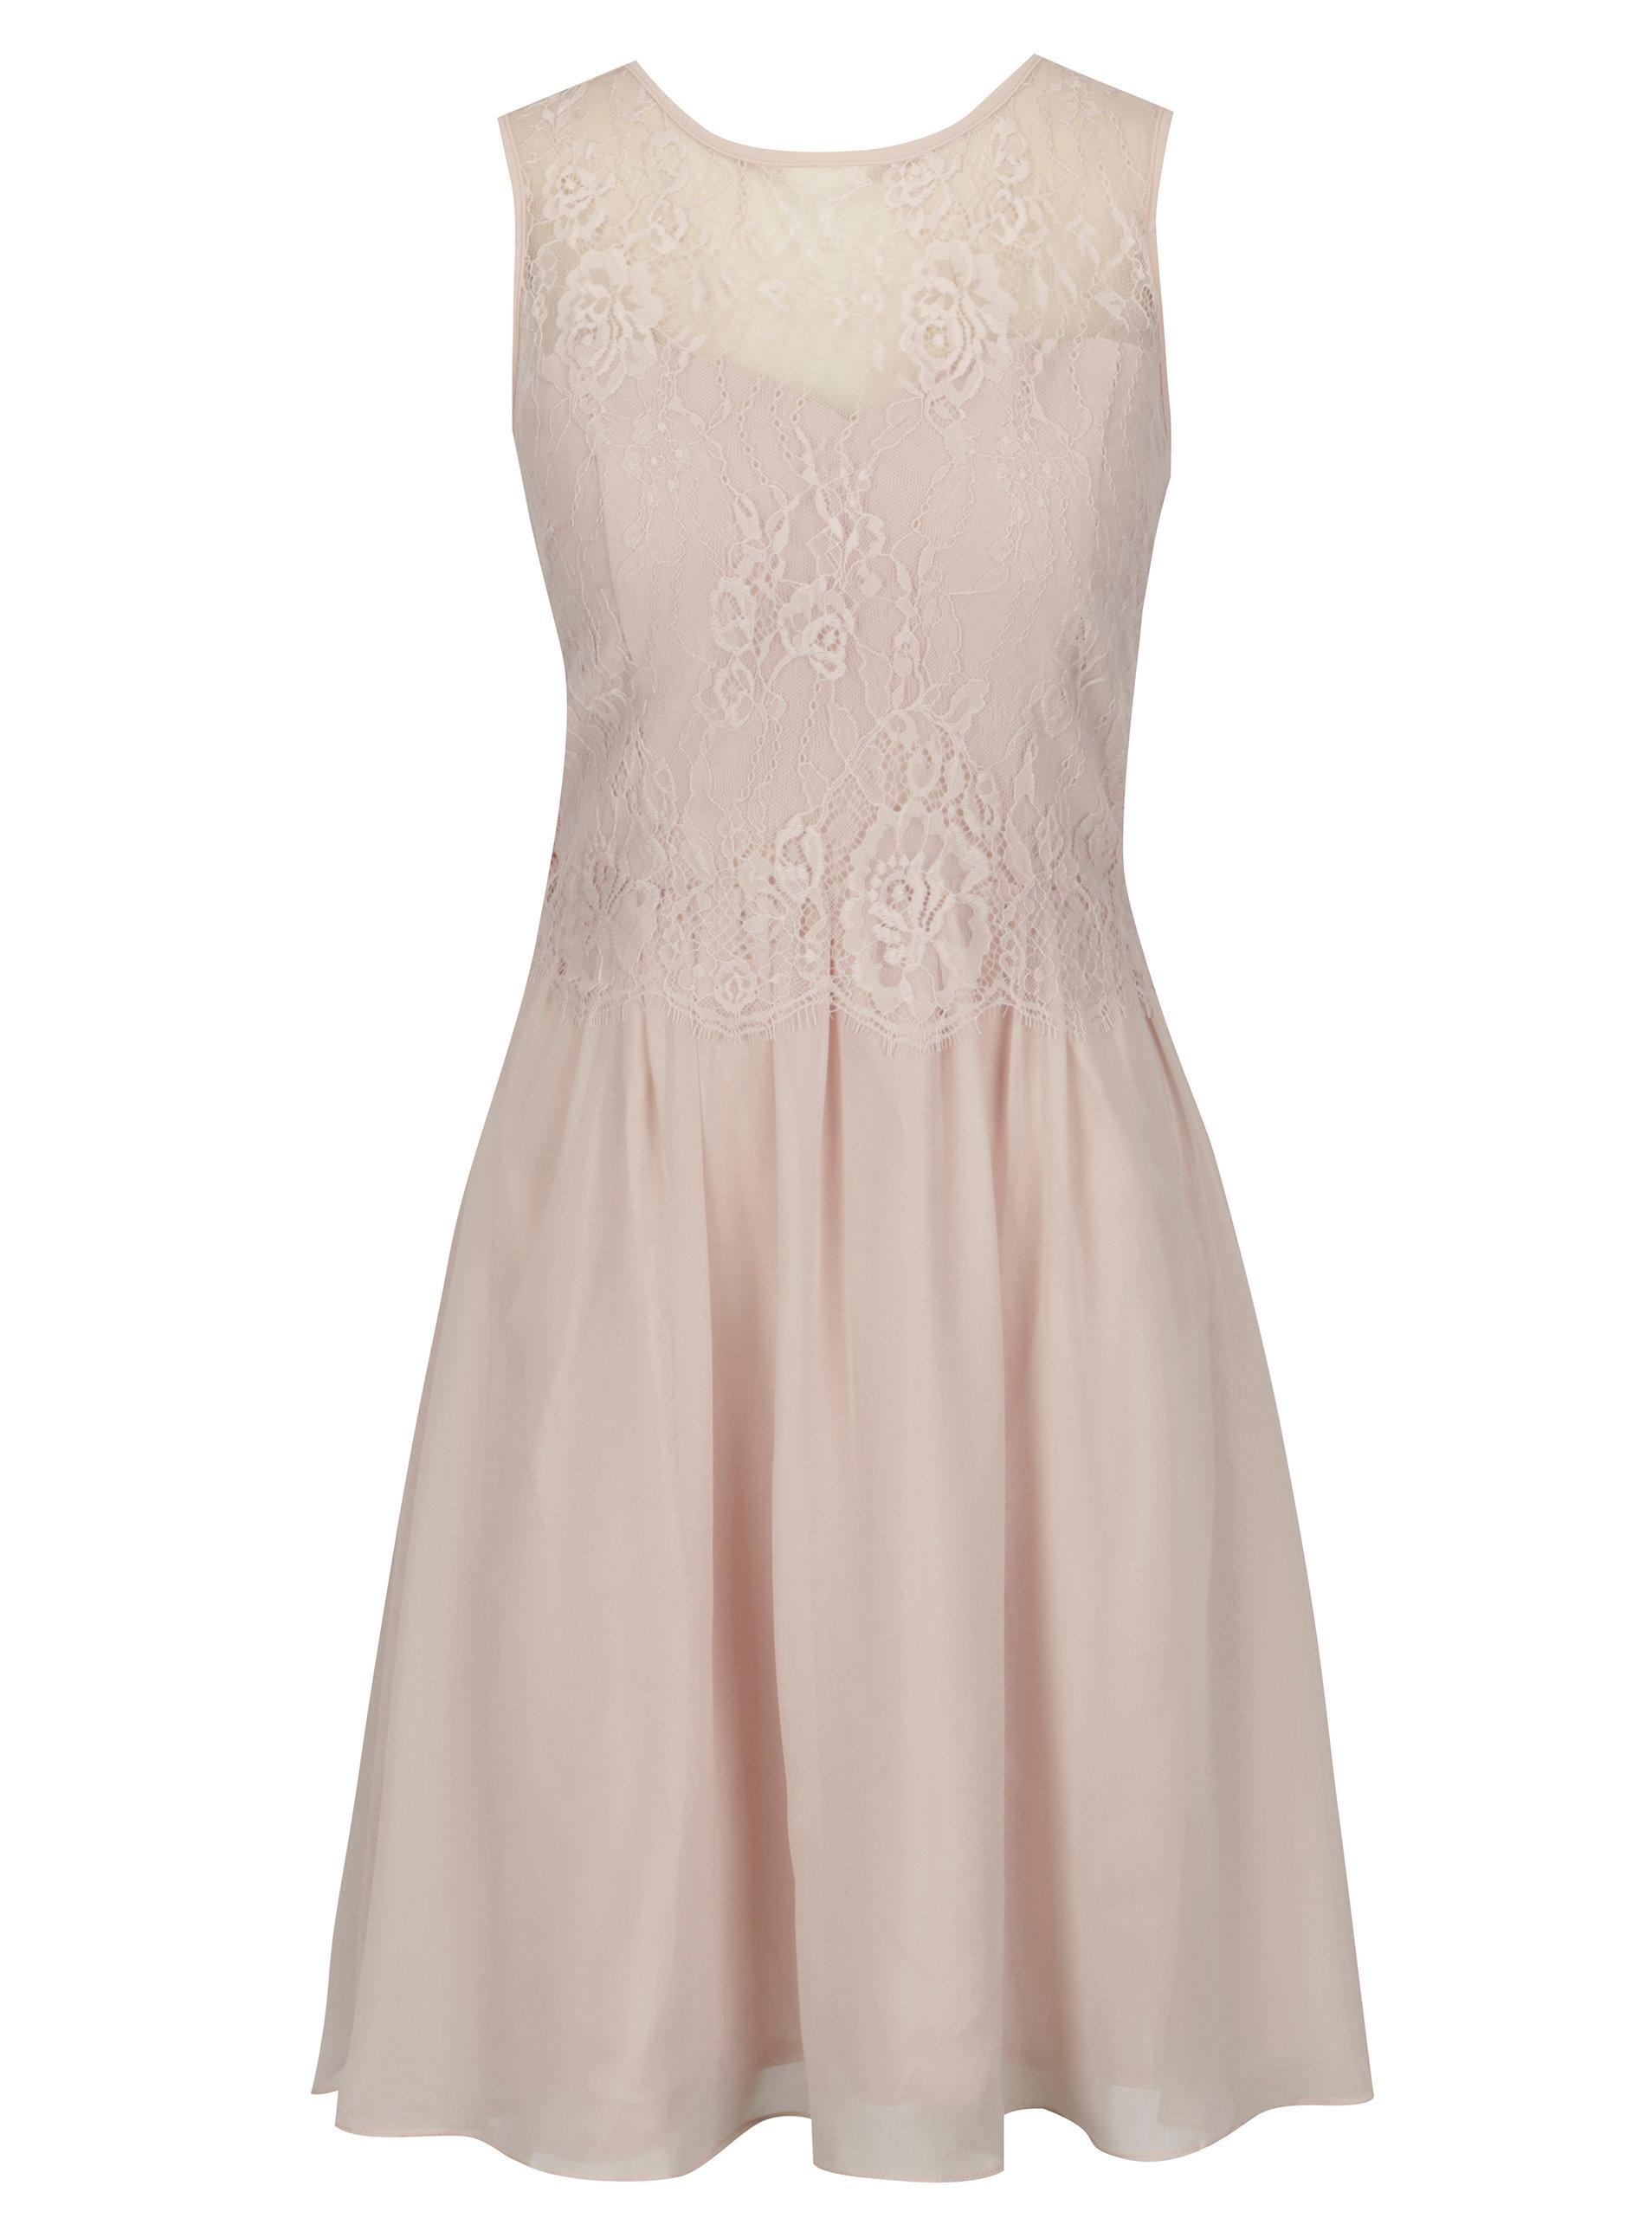 Starorůžové společenské šaty Dorothy Perkins